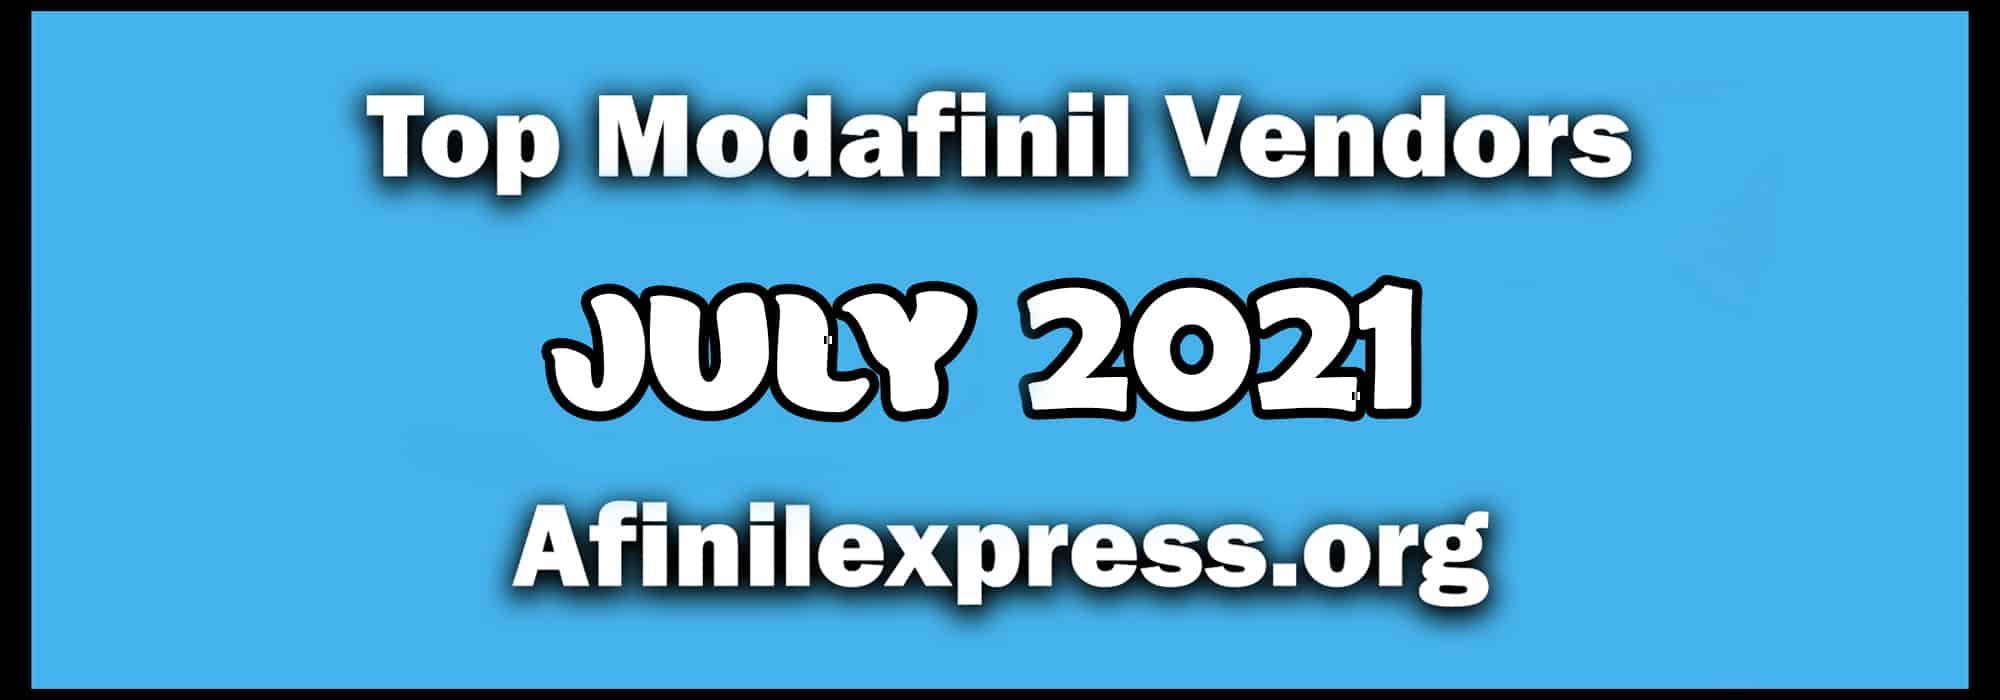 Top 3 Modafinil Vendors July2021